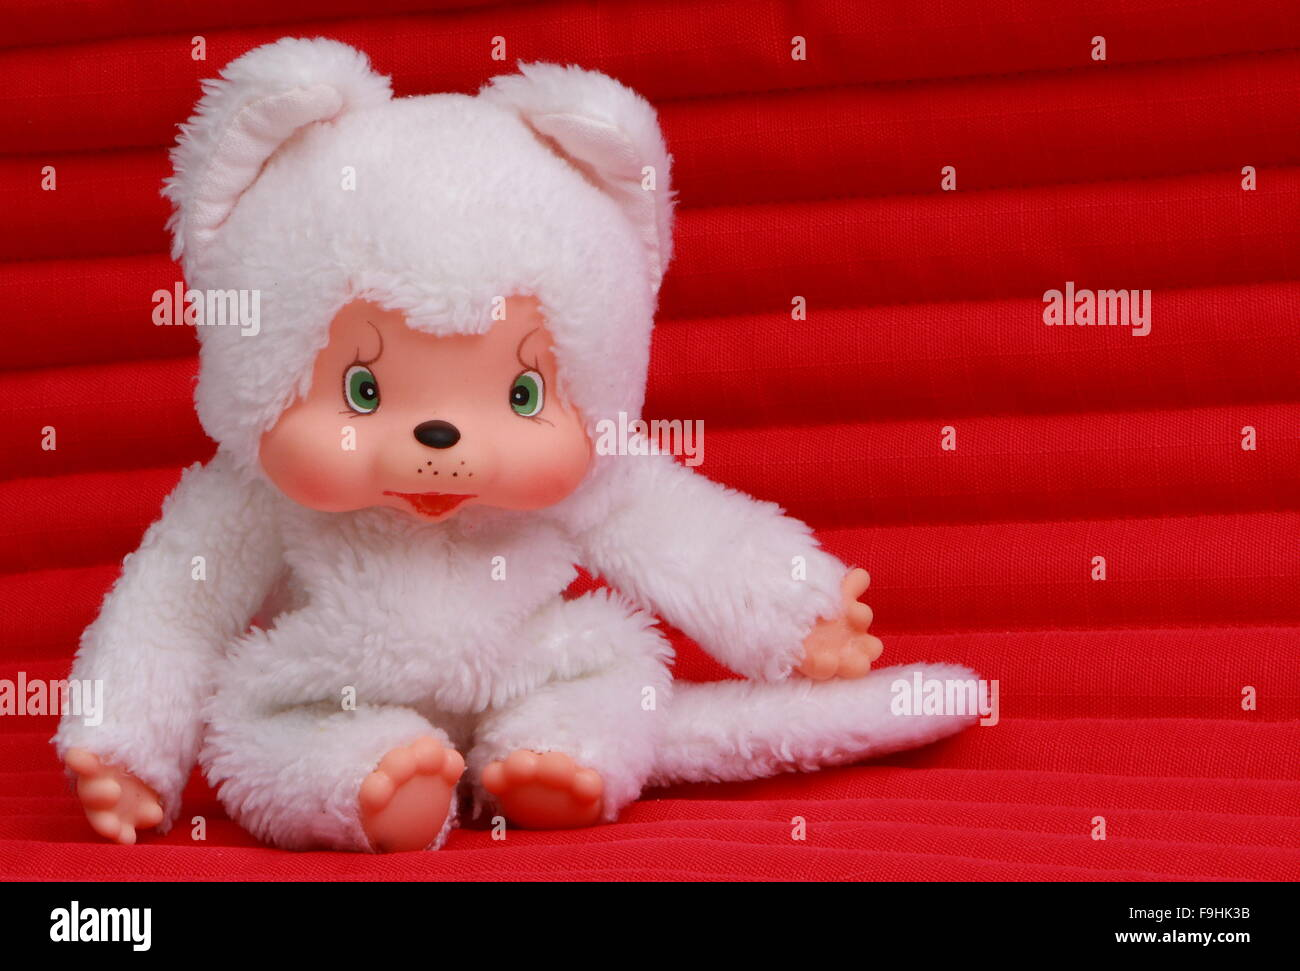 Brinquedo retrô Imagens de Stock